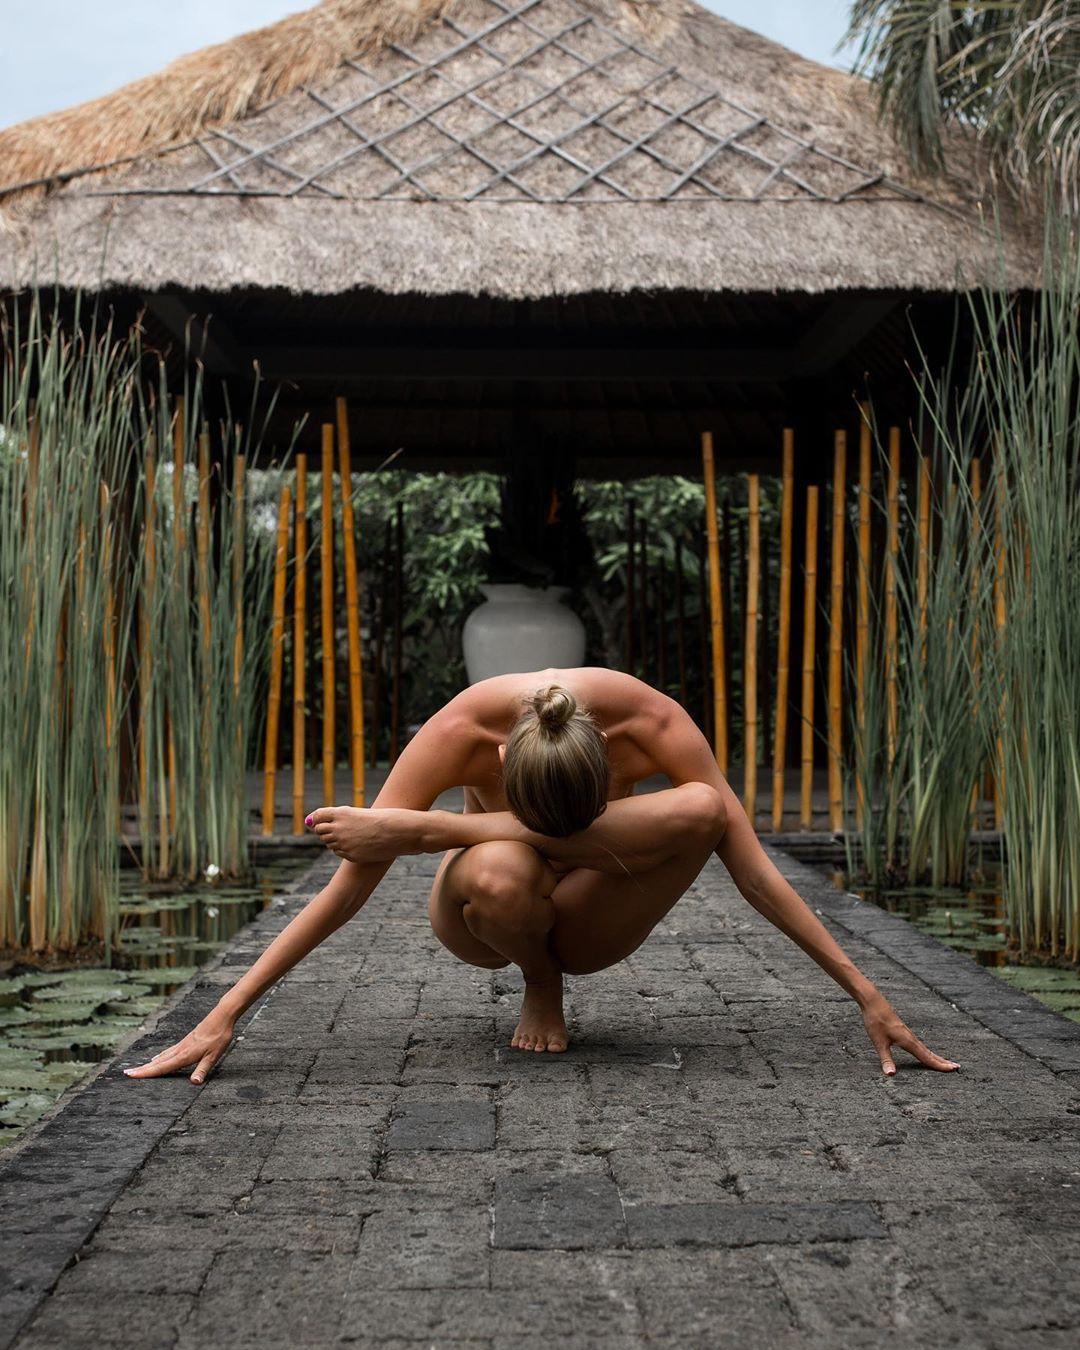 Nude Yoga Girl (Photo: nude_yogagirl / Instagram)